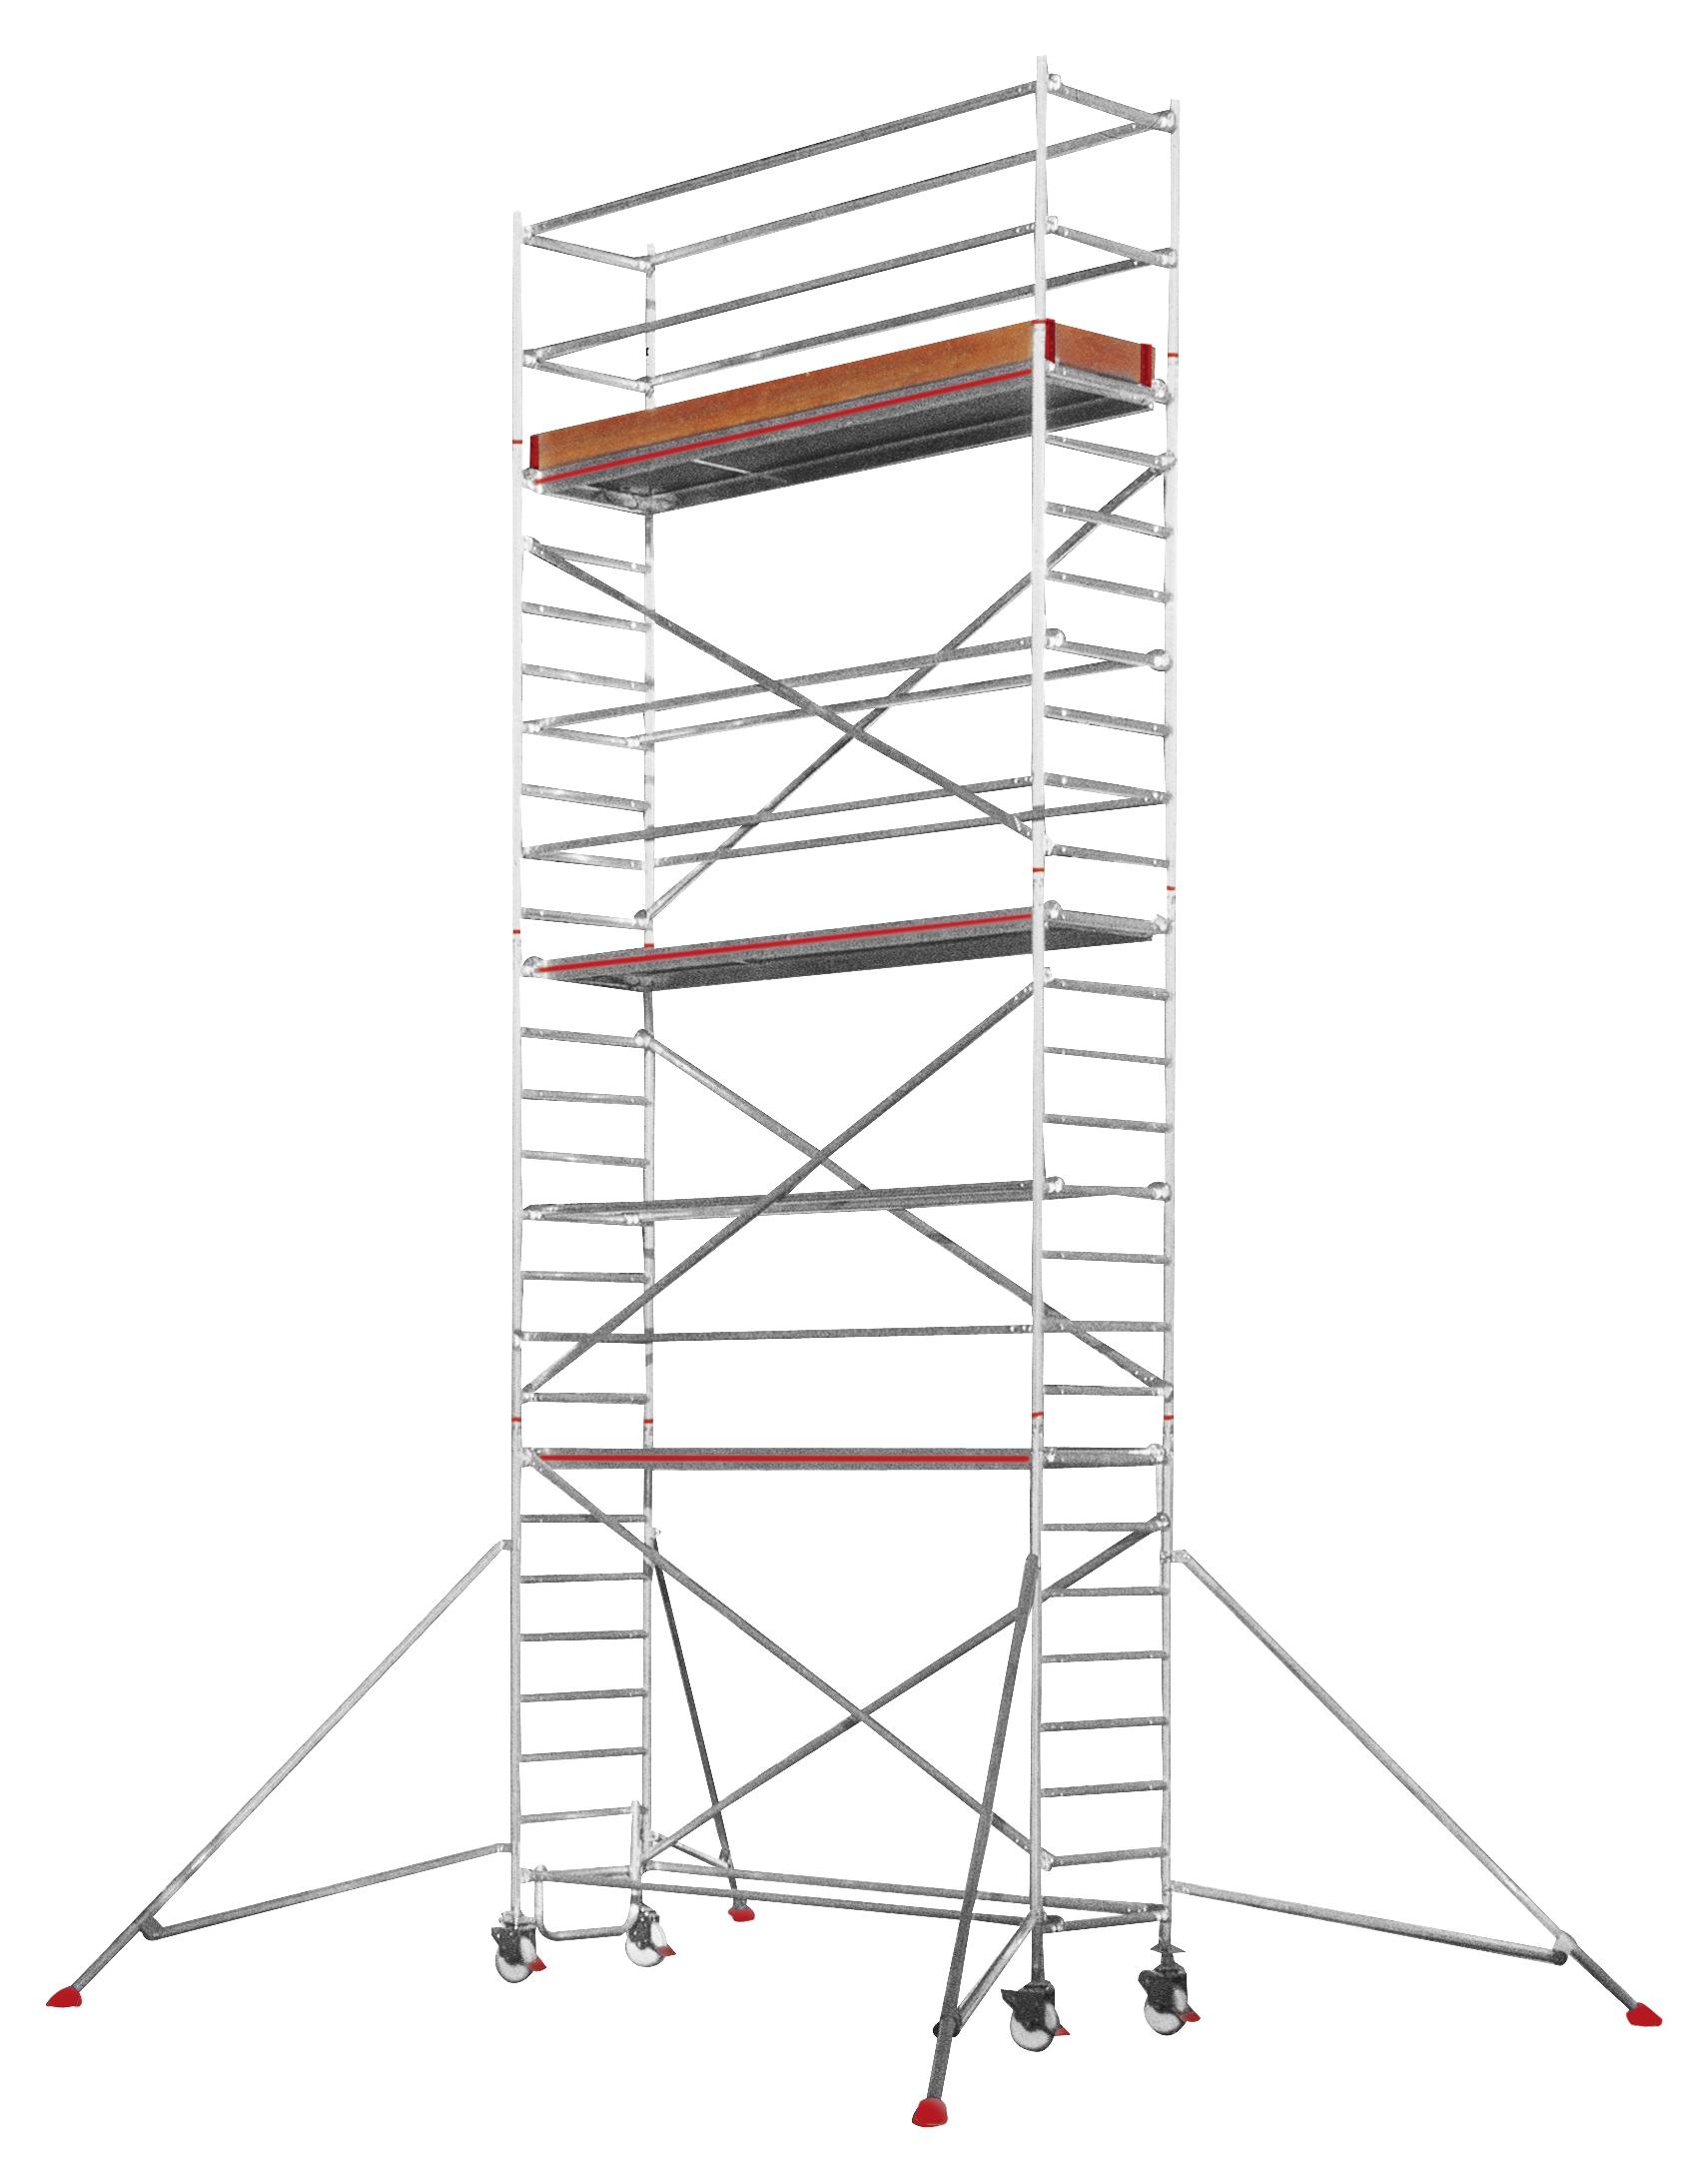 echafaudages roulants aluminium. Black Bedroom Furniture Sets. Home Design Ideas